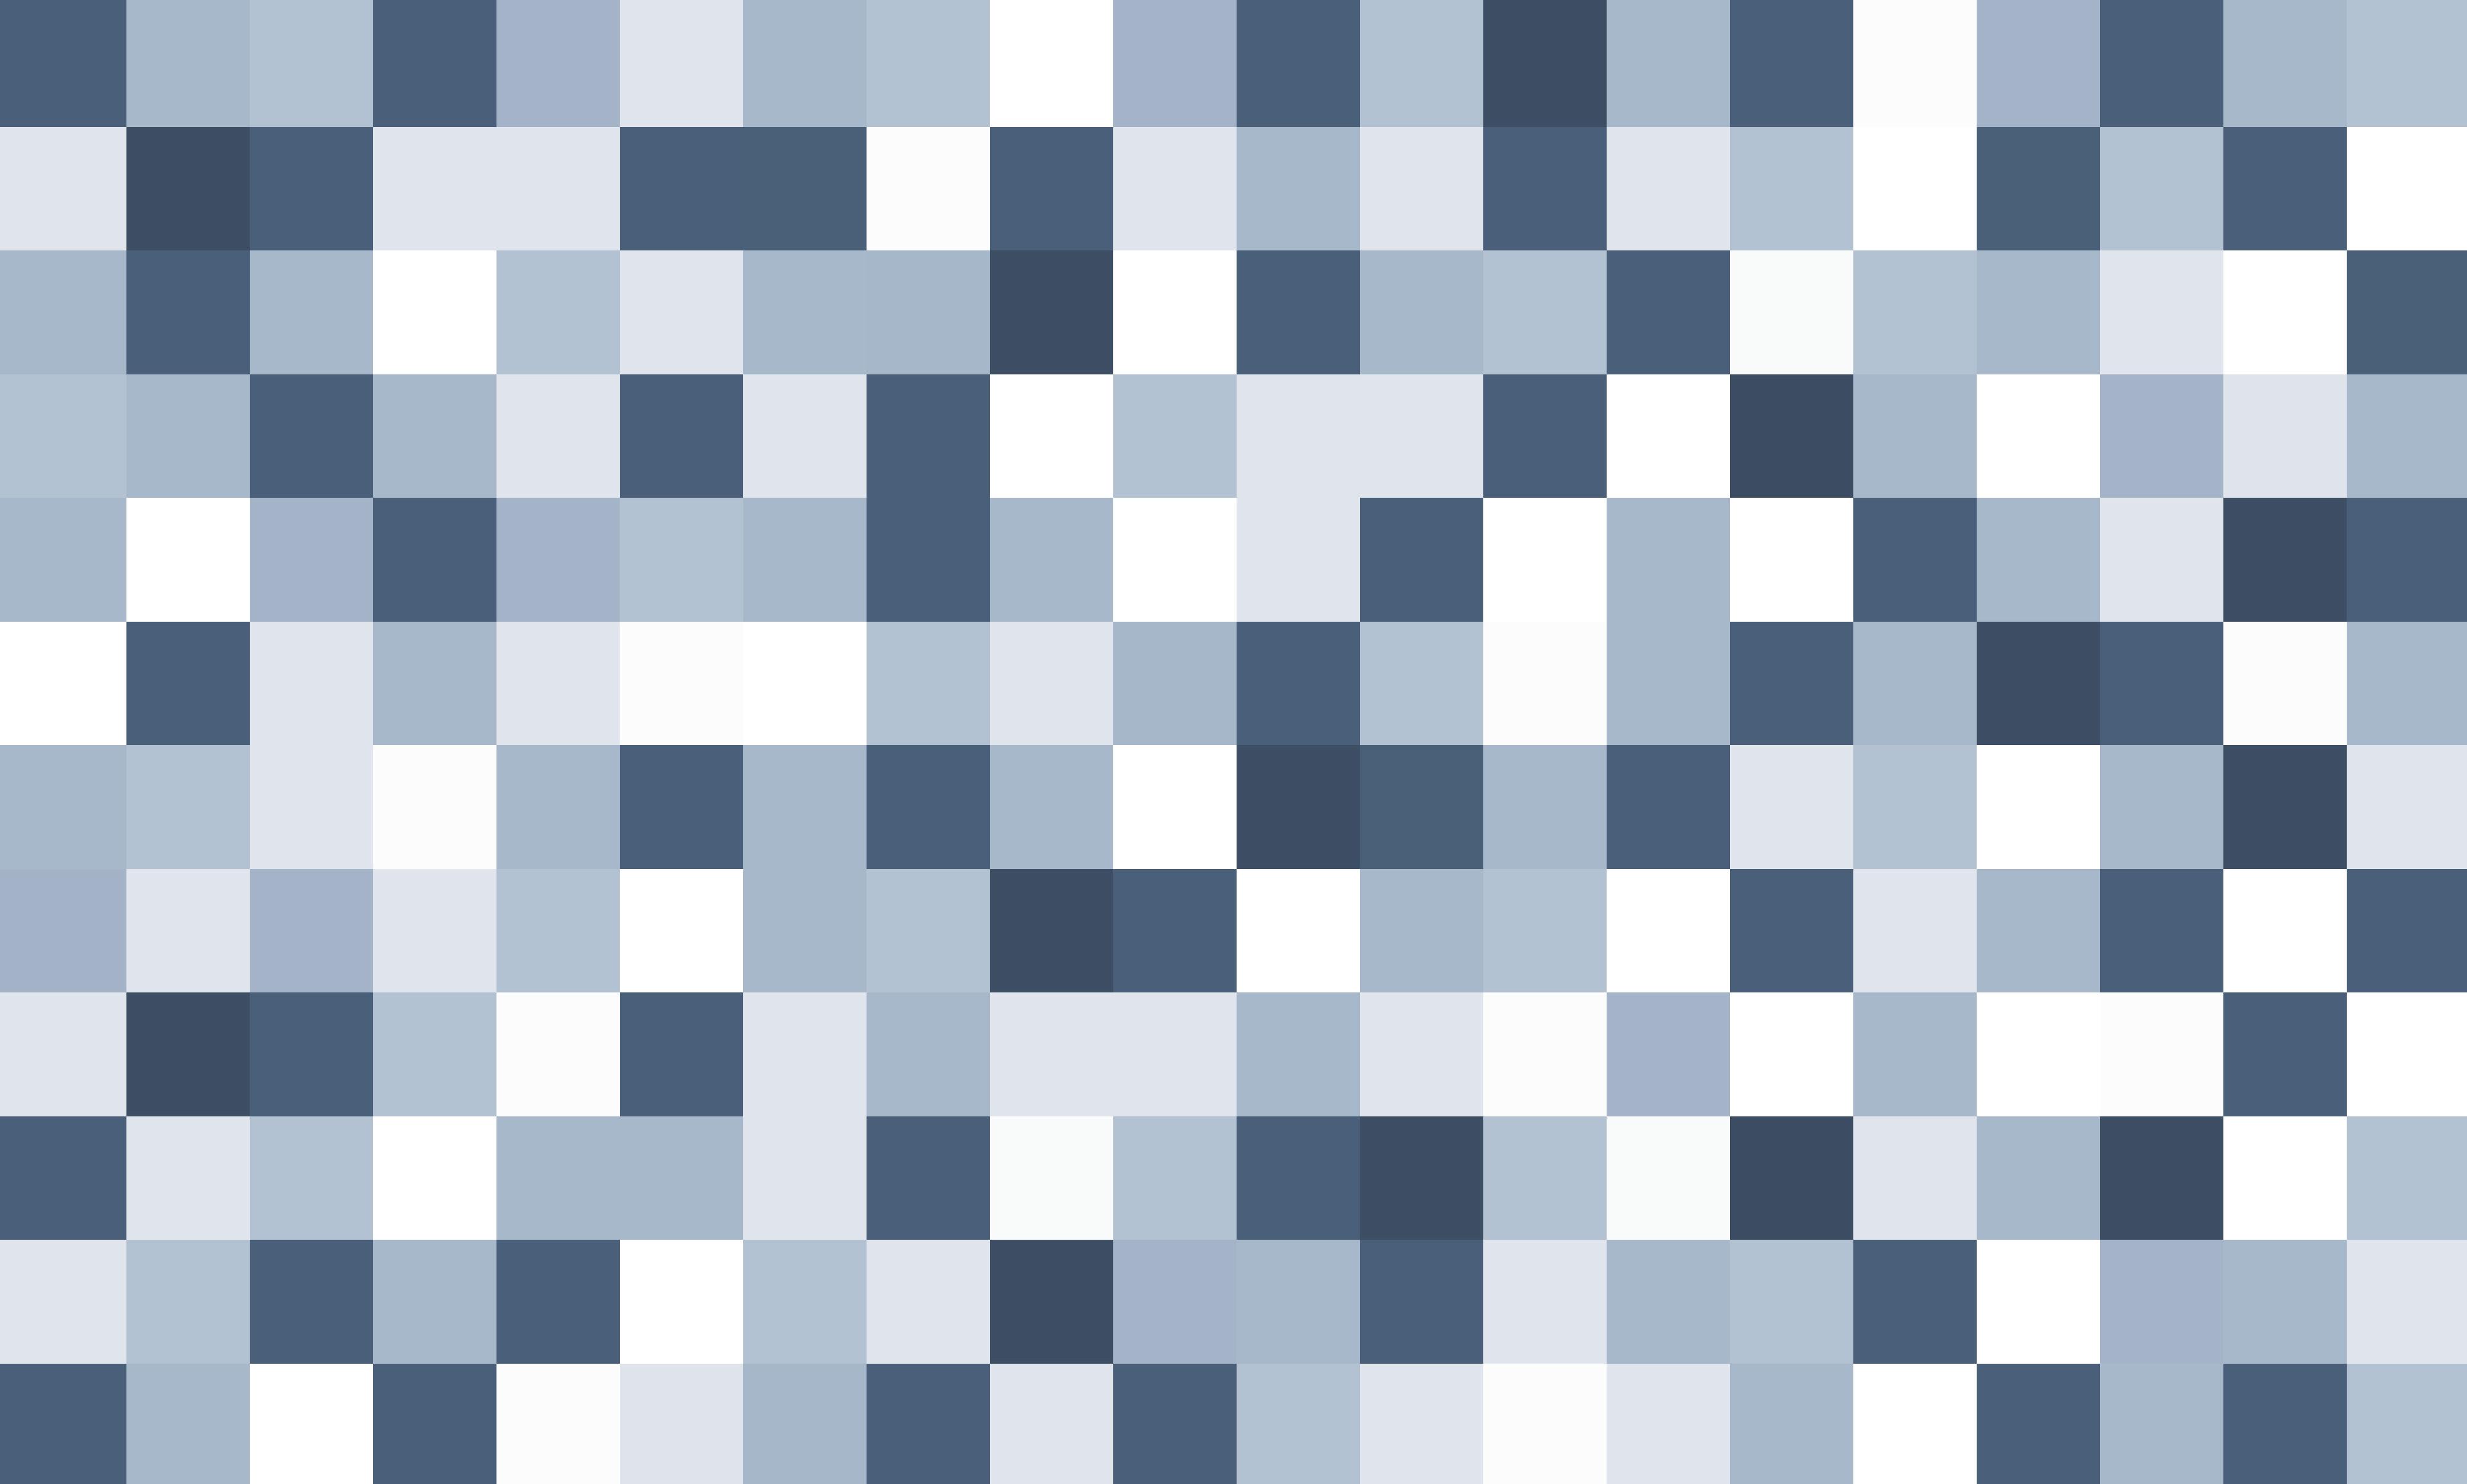 Squares grey squares